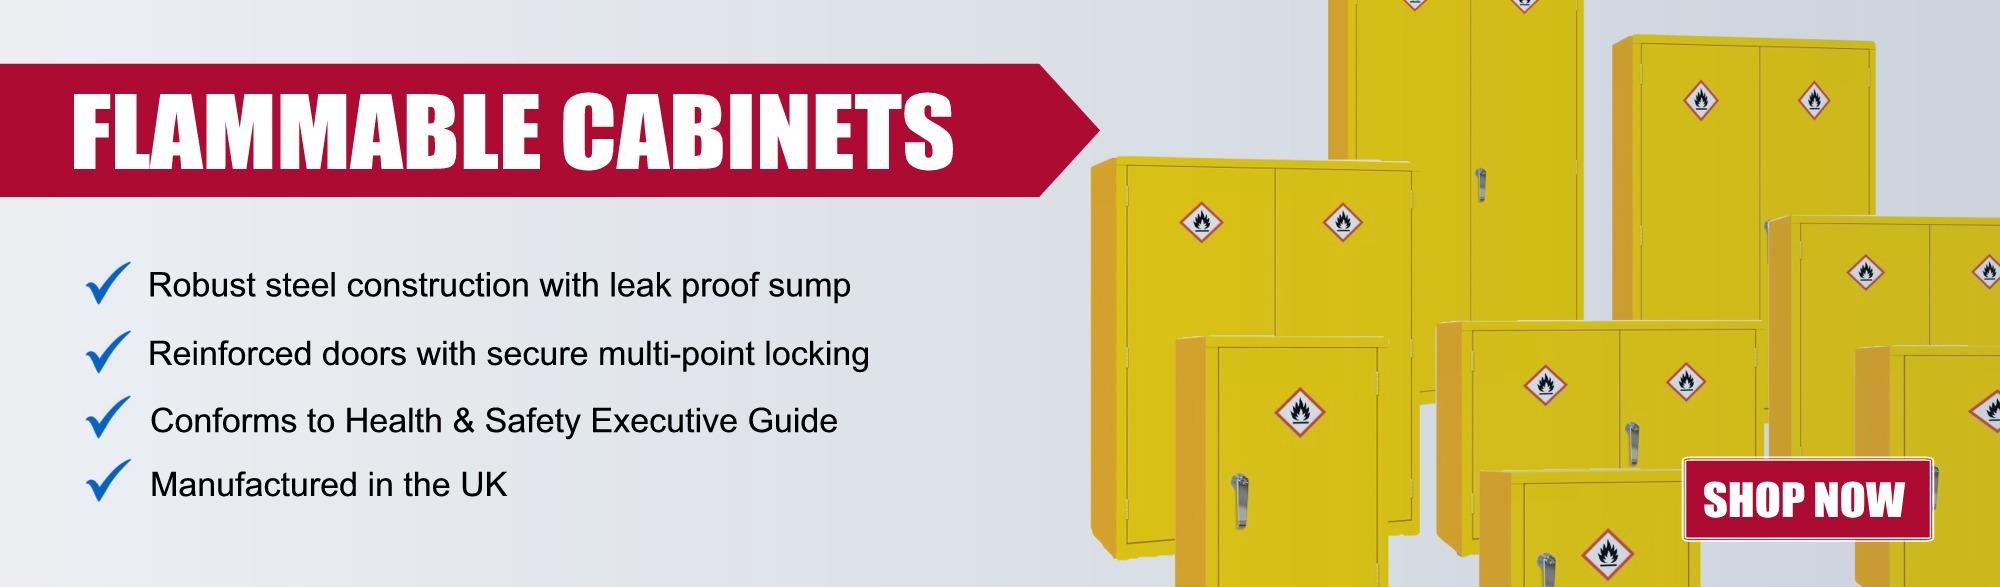 hazardous cabinets from £132.49